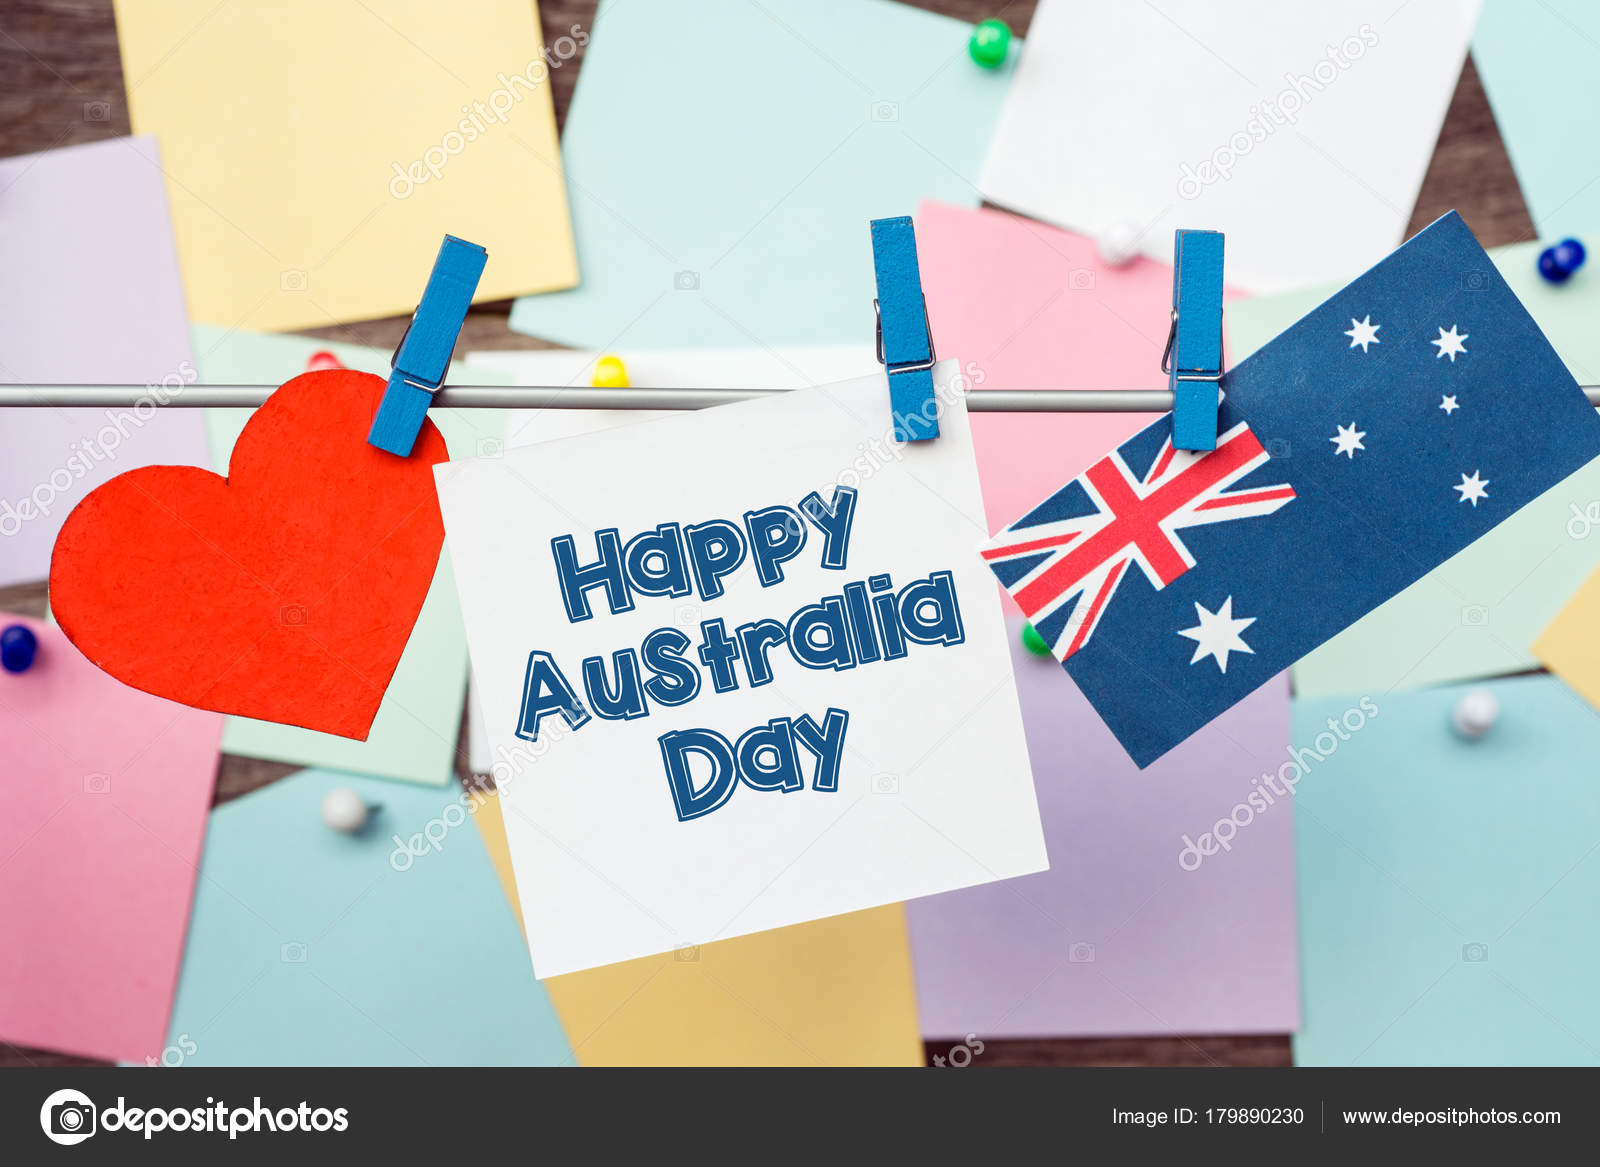 Celebrate australia day holiday january happy australia day message celebrate australia day holiday january happy australia day message greeting stock photo m4hsunfo